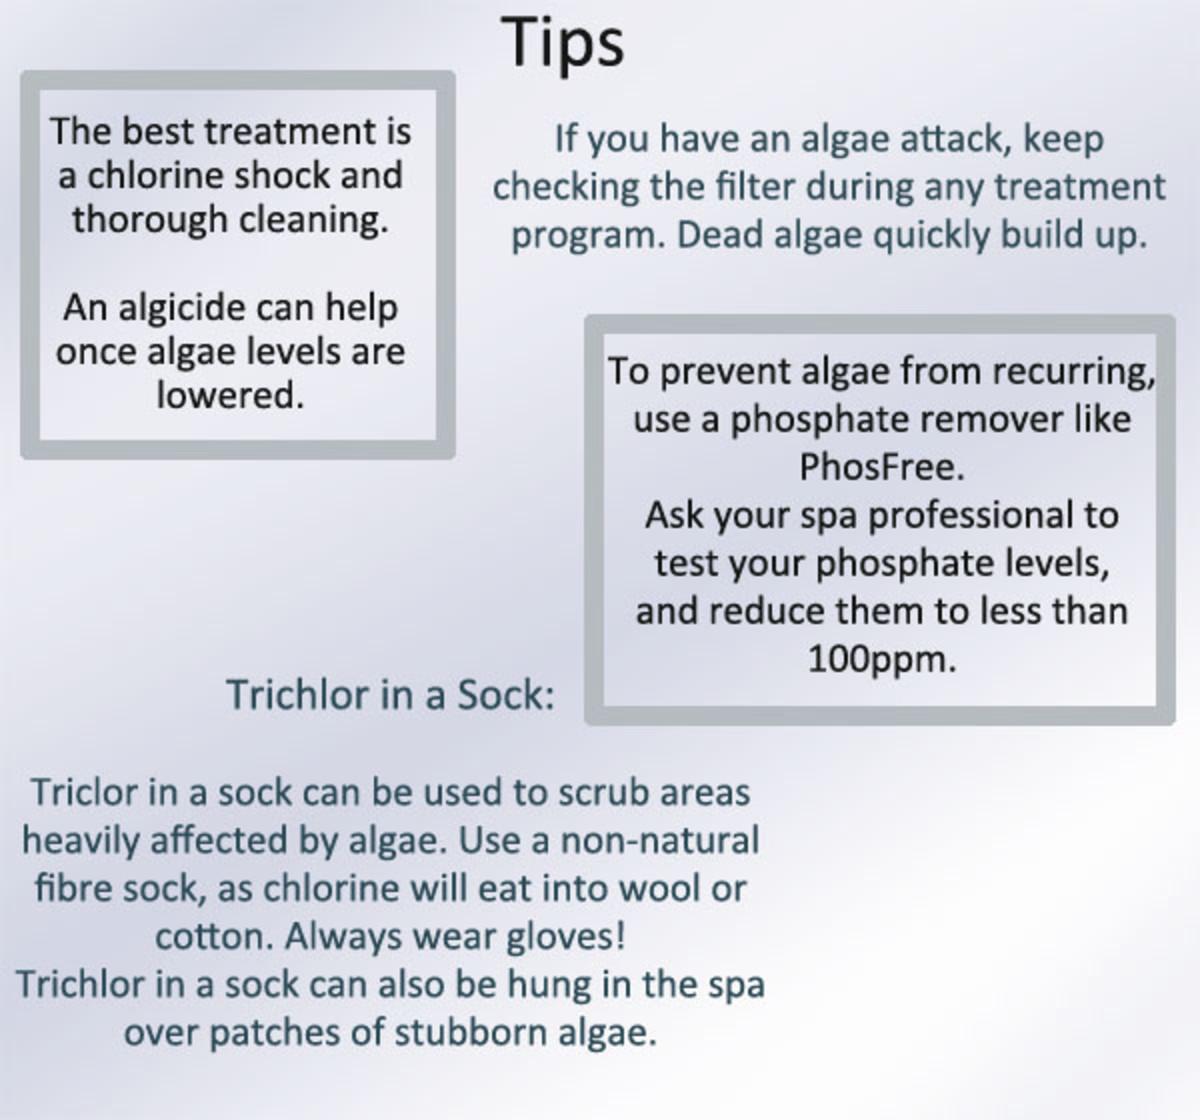 Eradicate algae in swimming pools and spas.